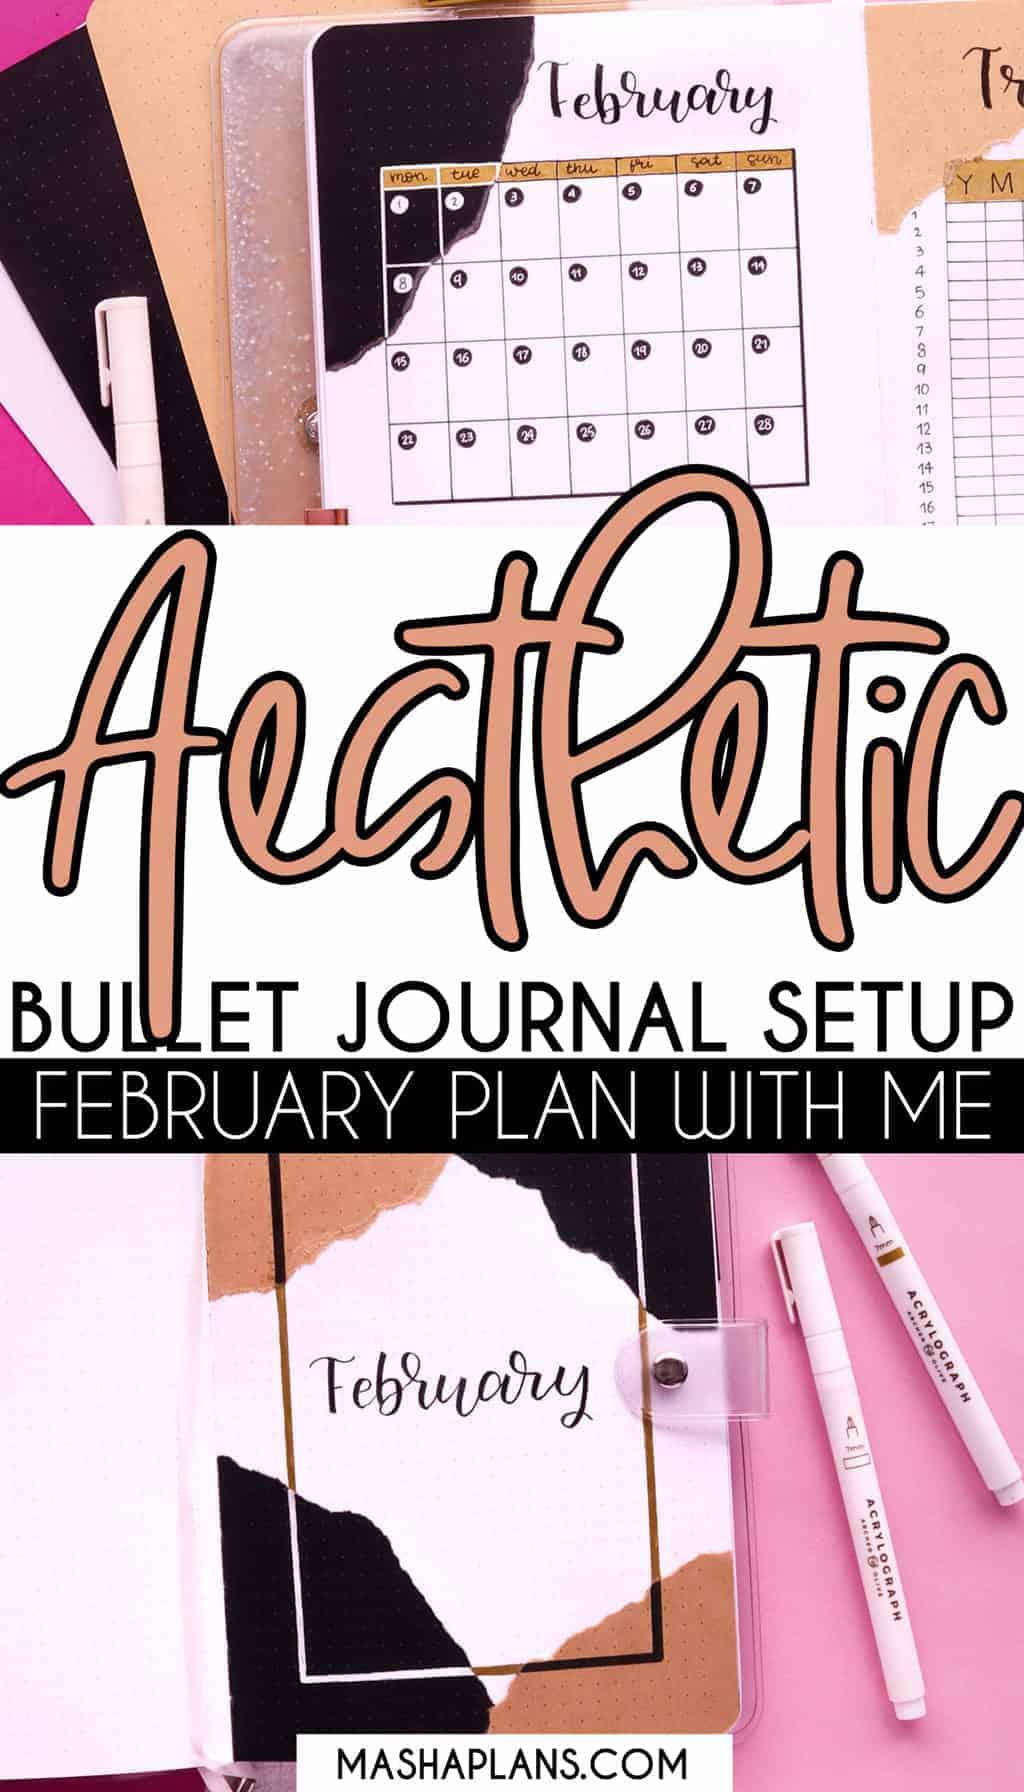 Aesthetic Bullet Journal Setup: February 2021 Plan With Me | Masha Plans